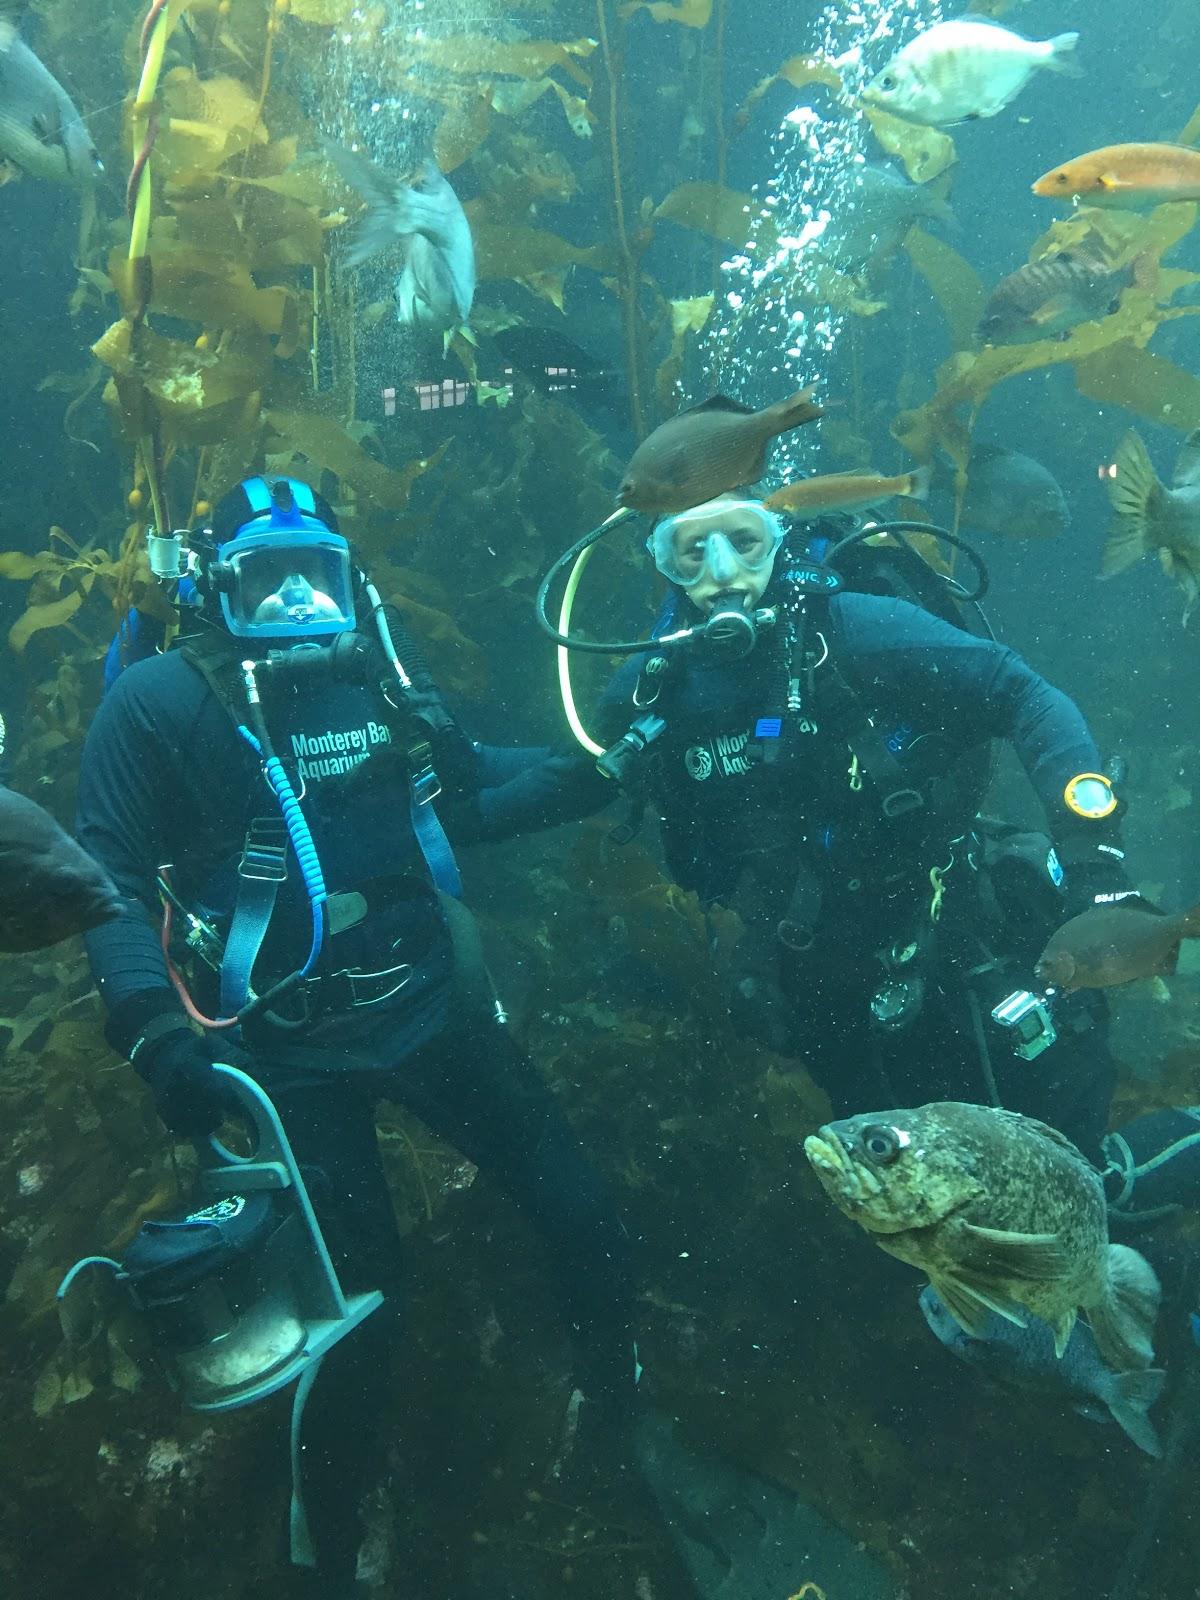 Scuba Diving In The Kelp Forest Exhibit Mbari